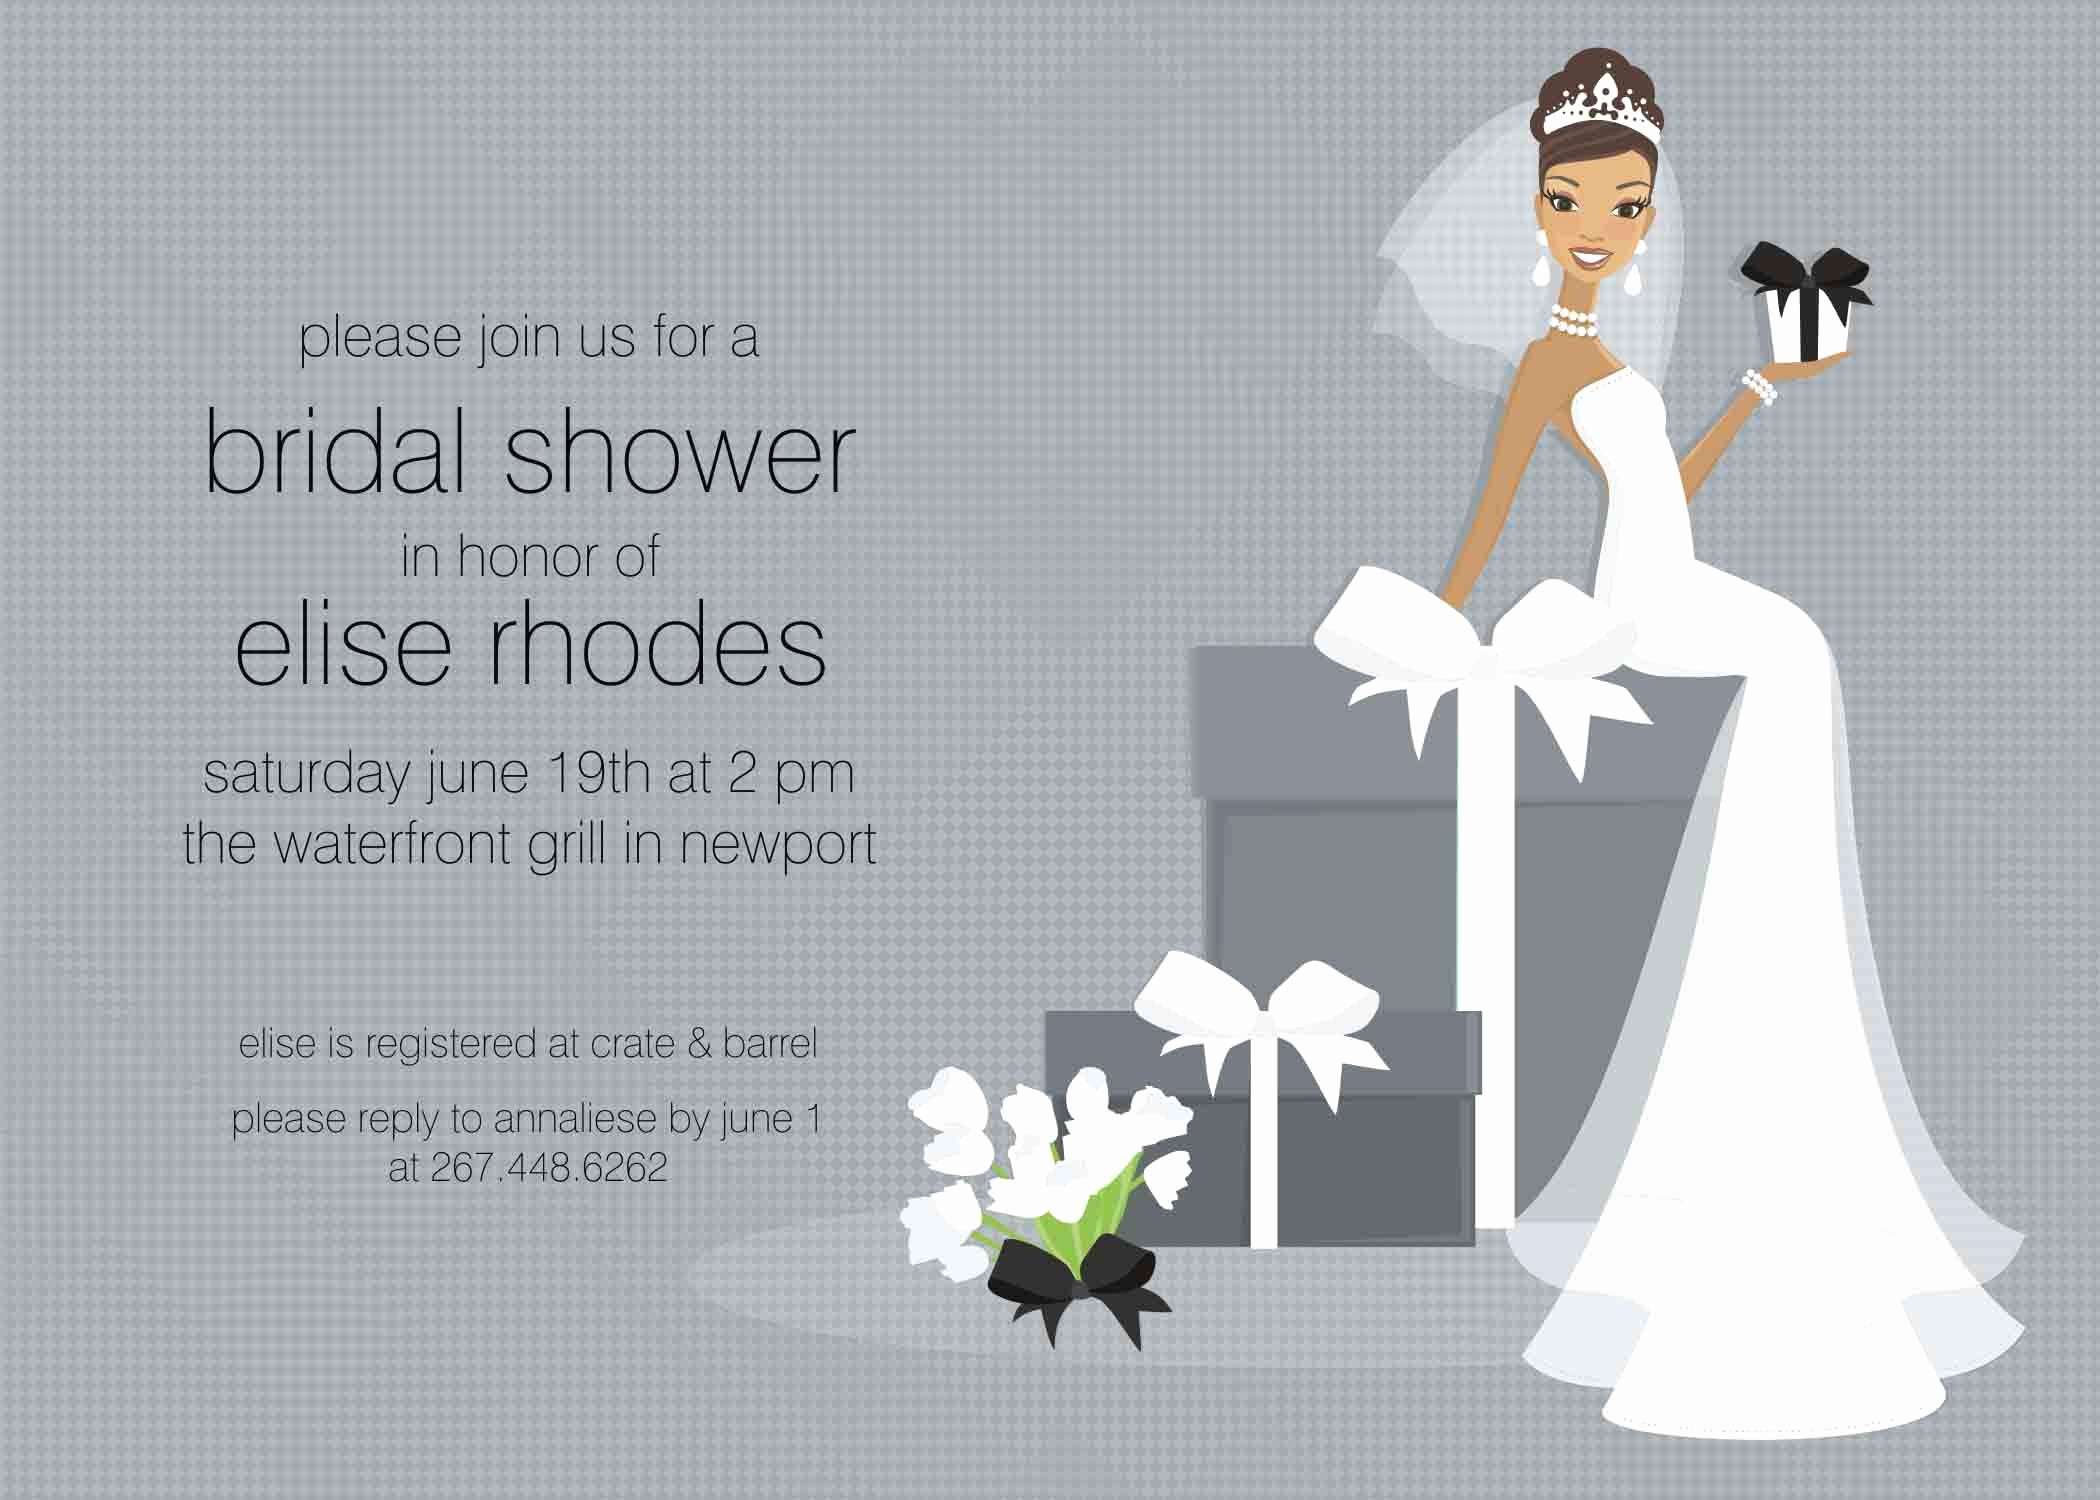 Free Bridal Shower Invitation Printables Elegant Bridal Shower Invite Template Chanel Bridal Shower